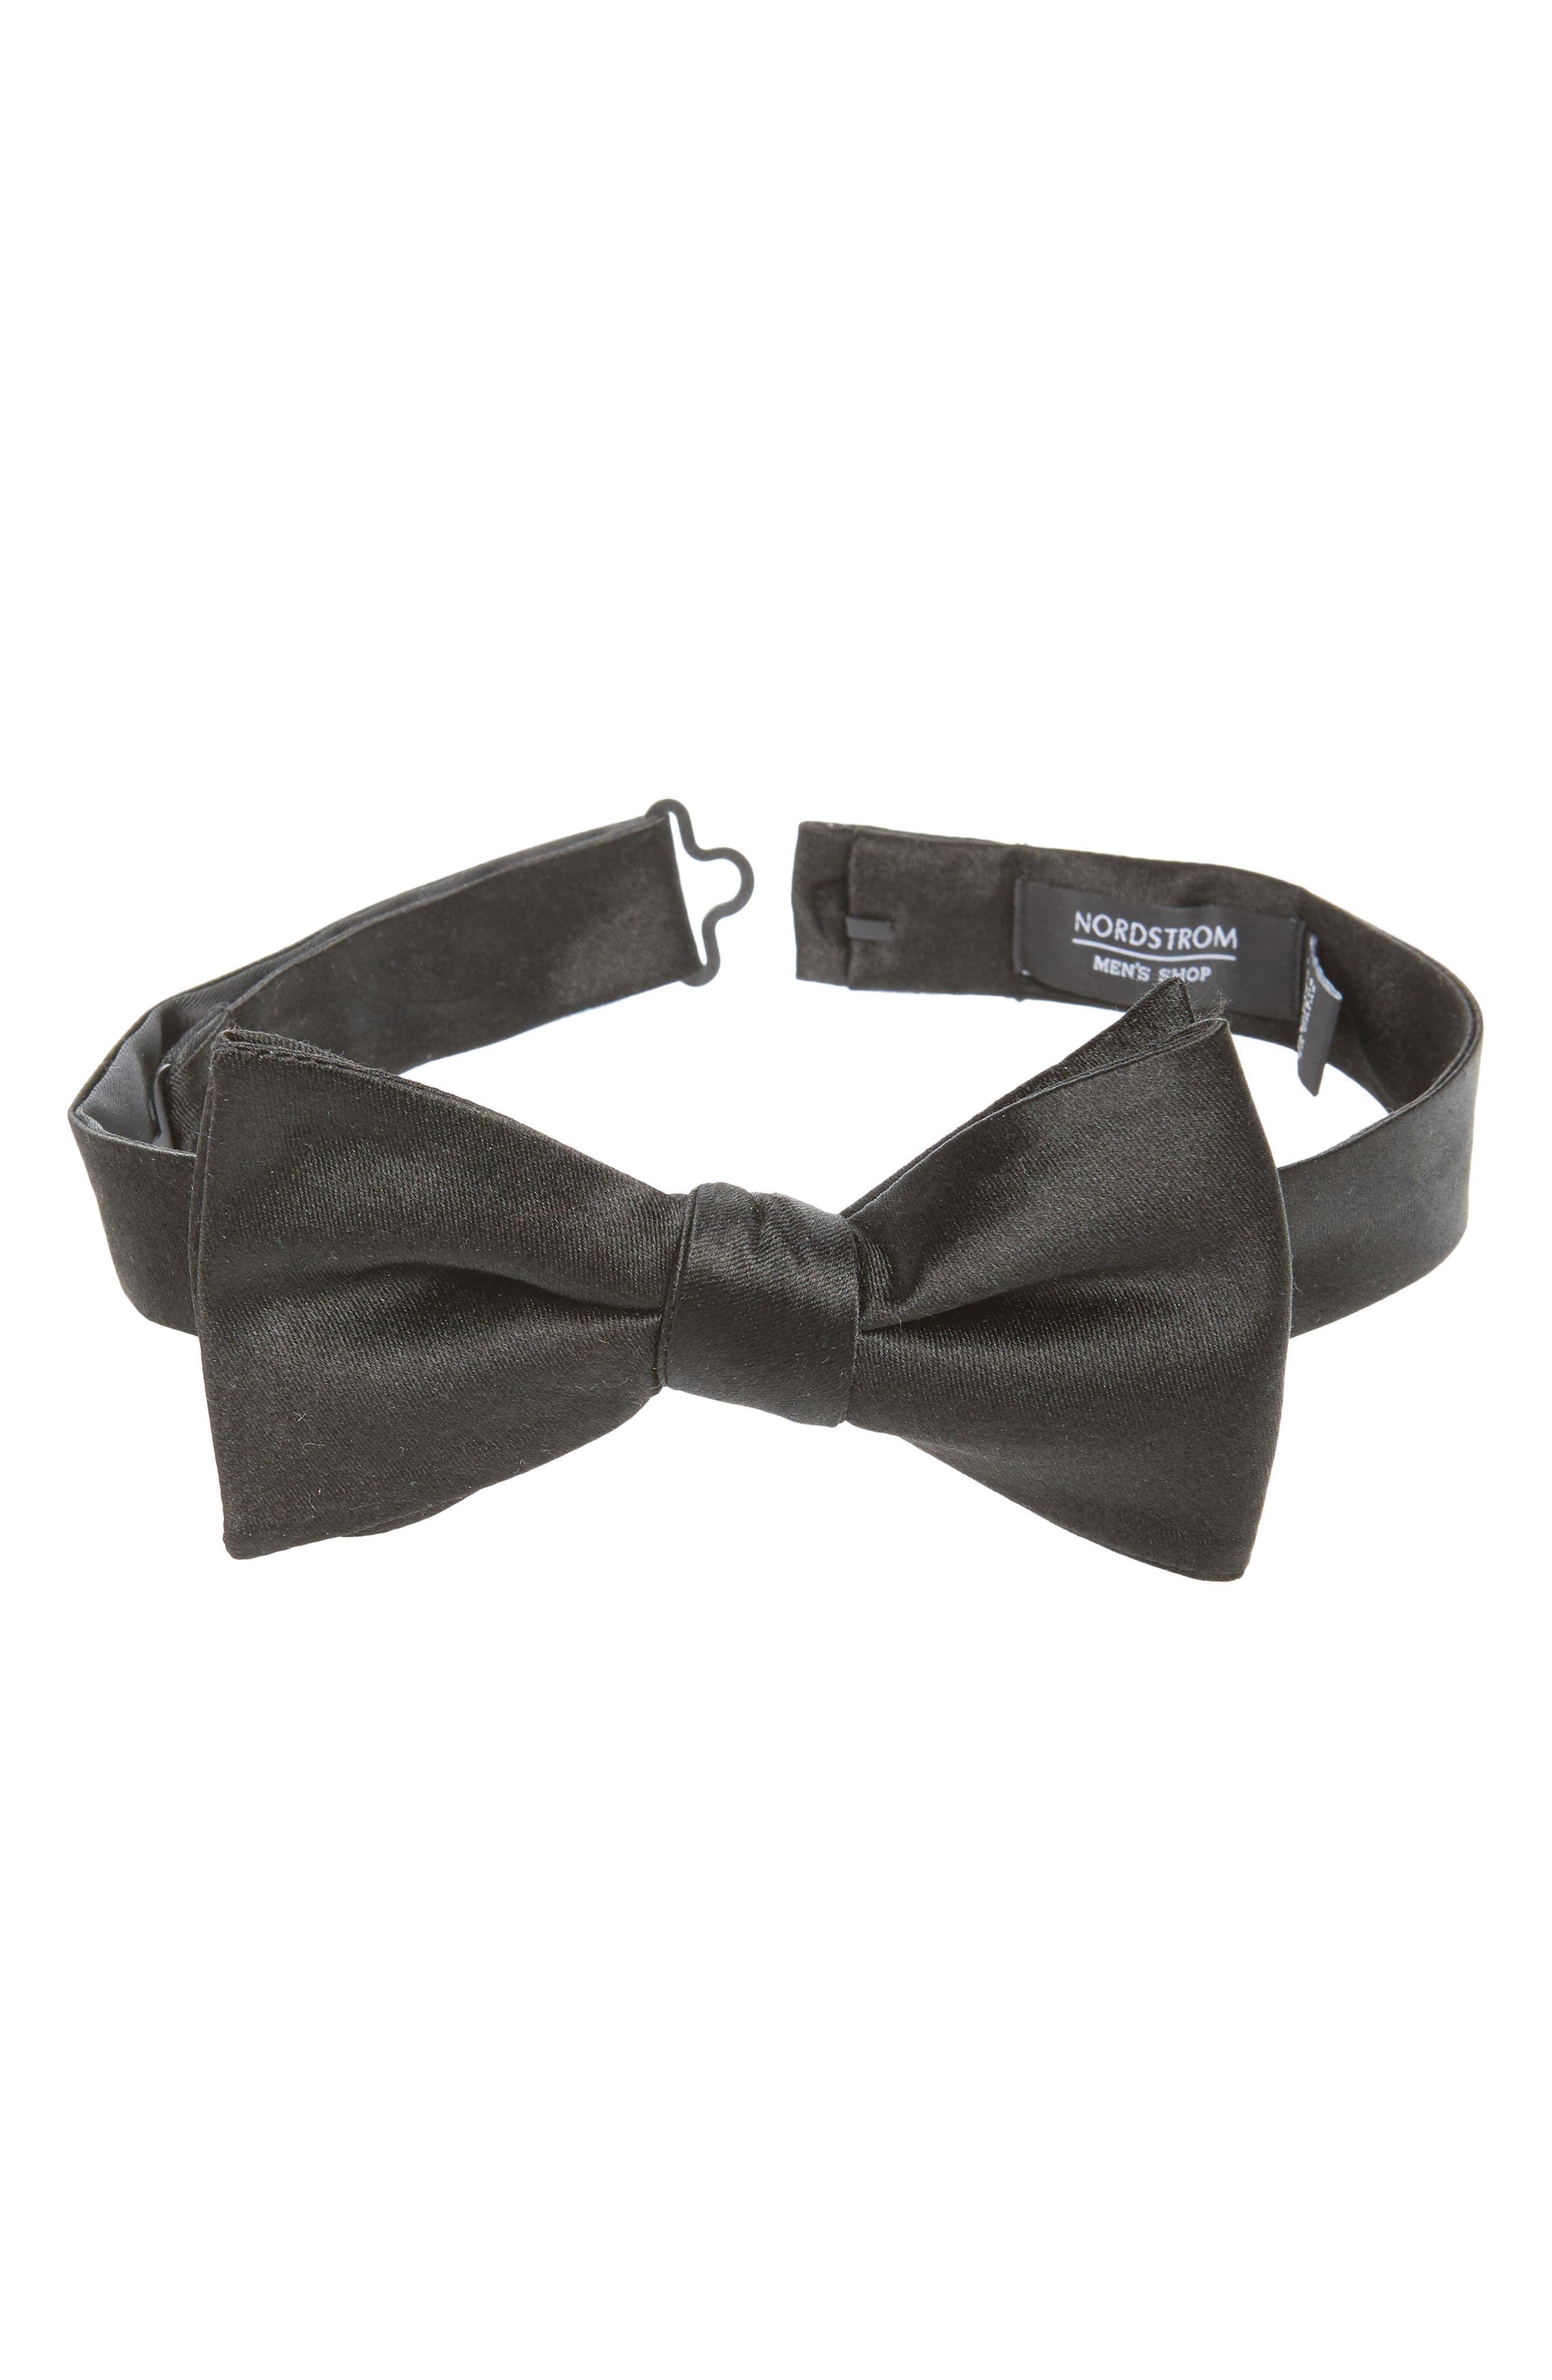 NORDSTROM MEN'S SHOP,                             Solid Silk Bow Tie,                             Main thumbnail 1, color,                             BLACK